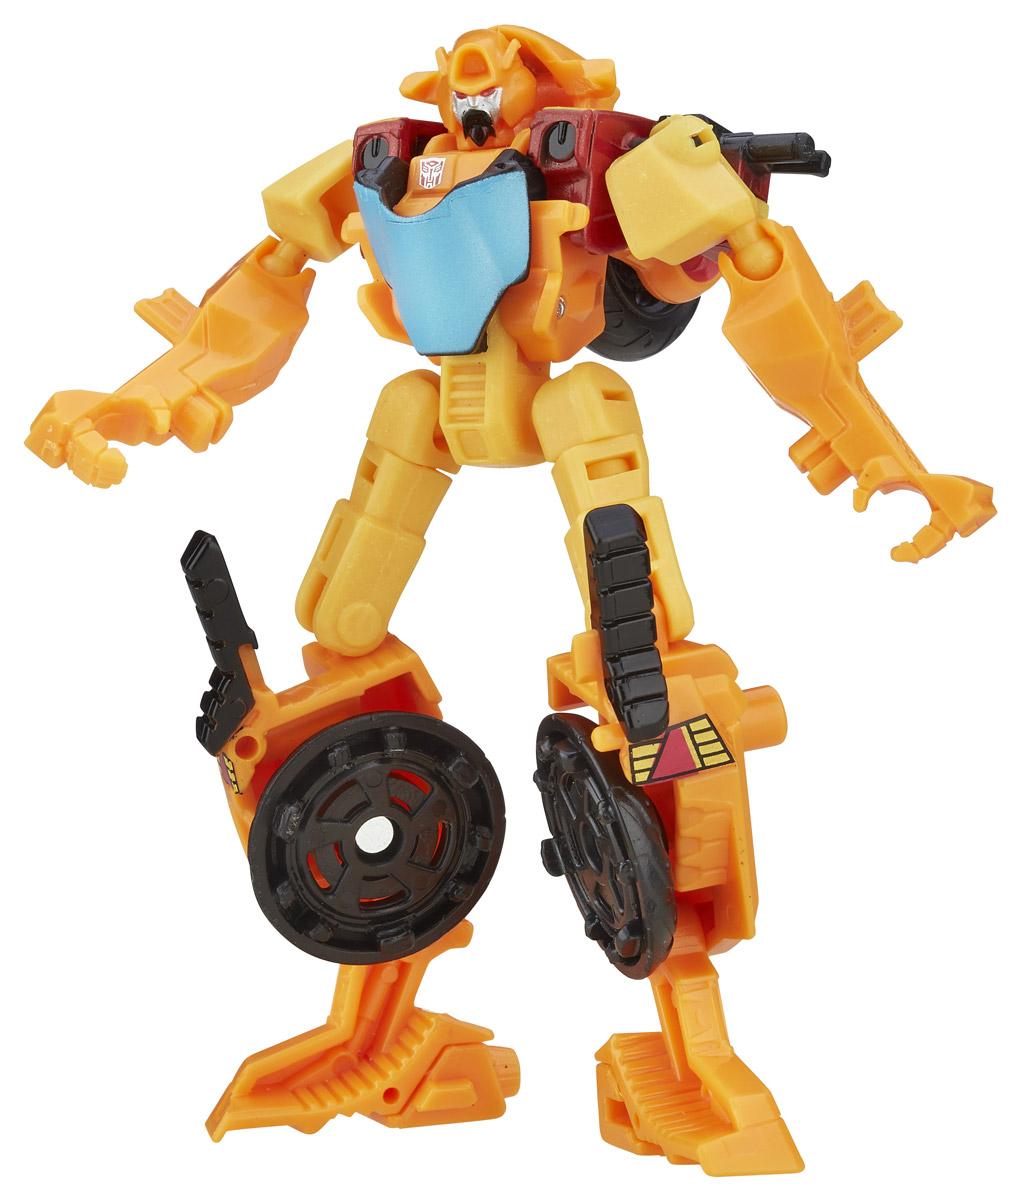 Transformers Трансформер Wreck-Gar